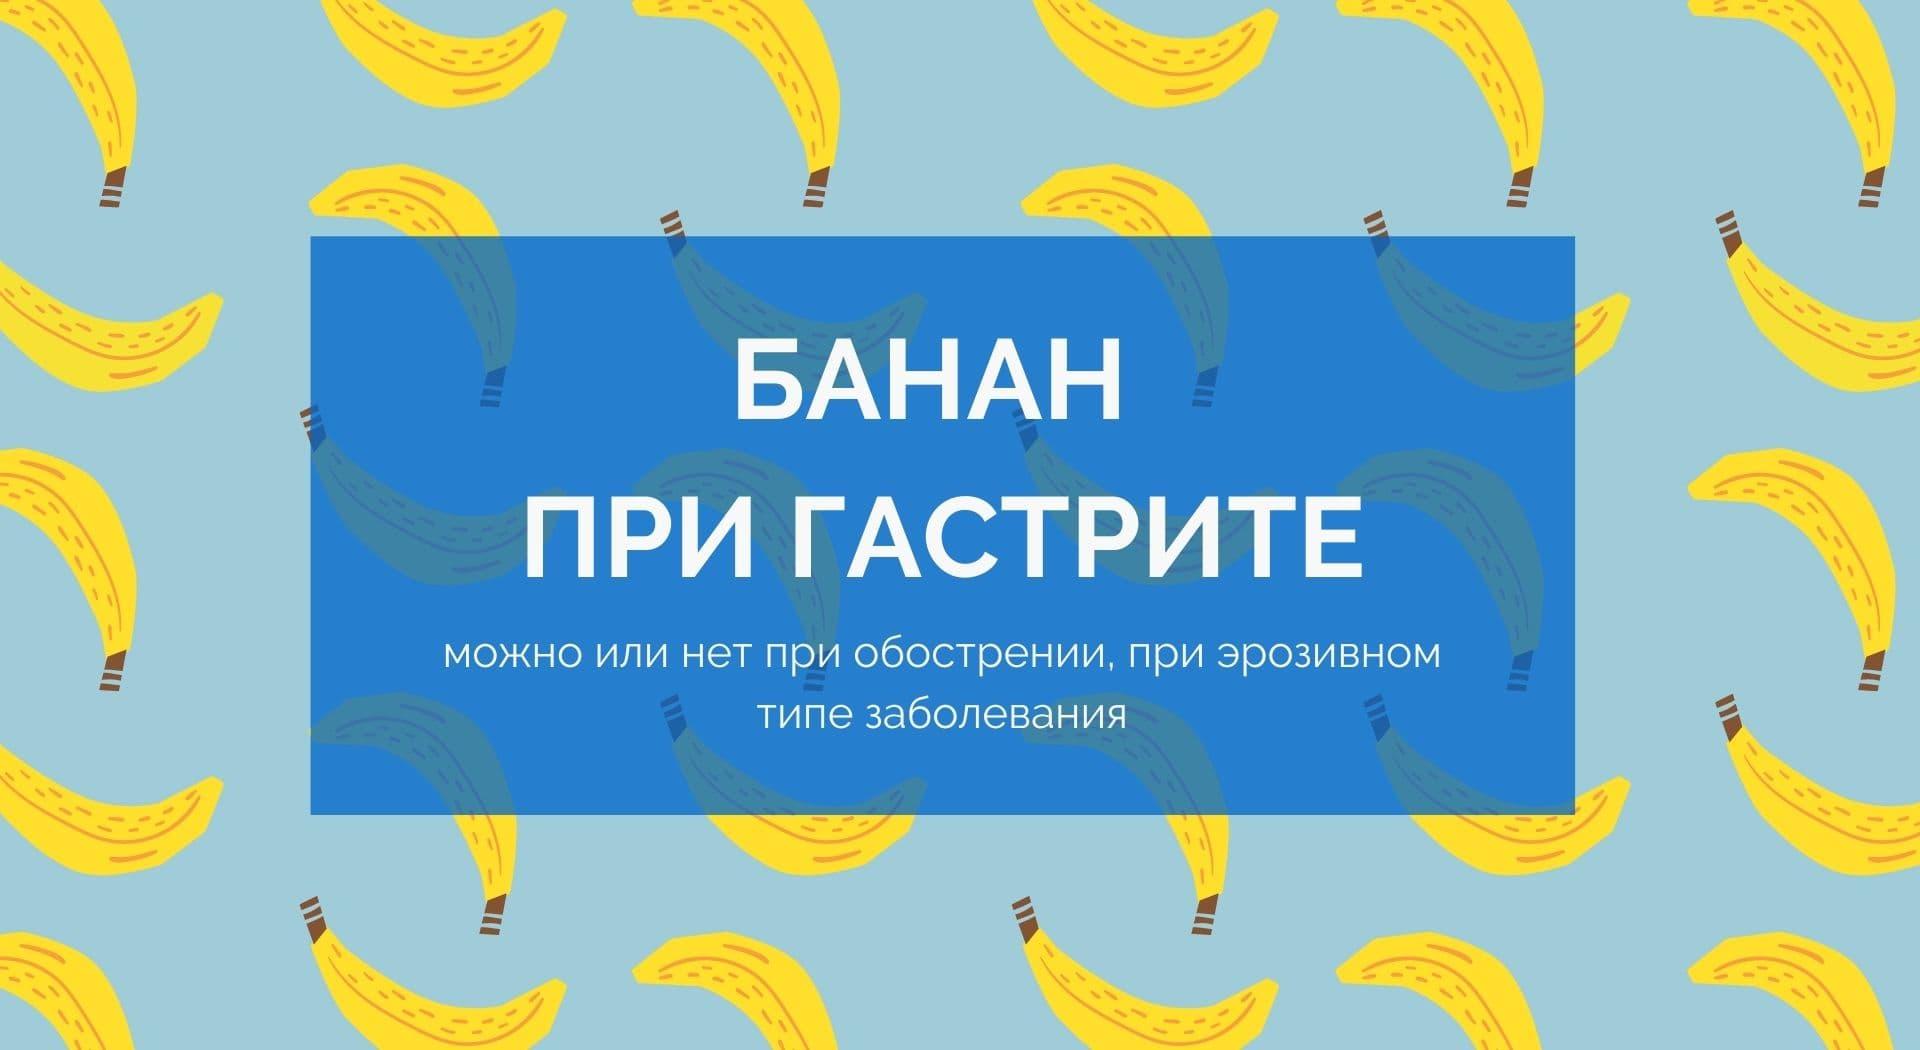 Банан при гастрите: можно или нет при обострении, при эрозивном типе заболевания